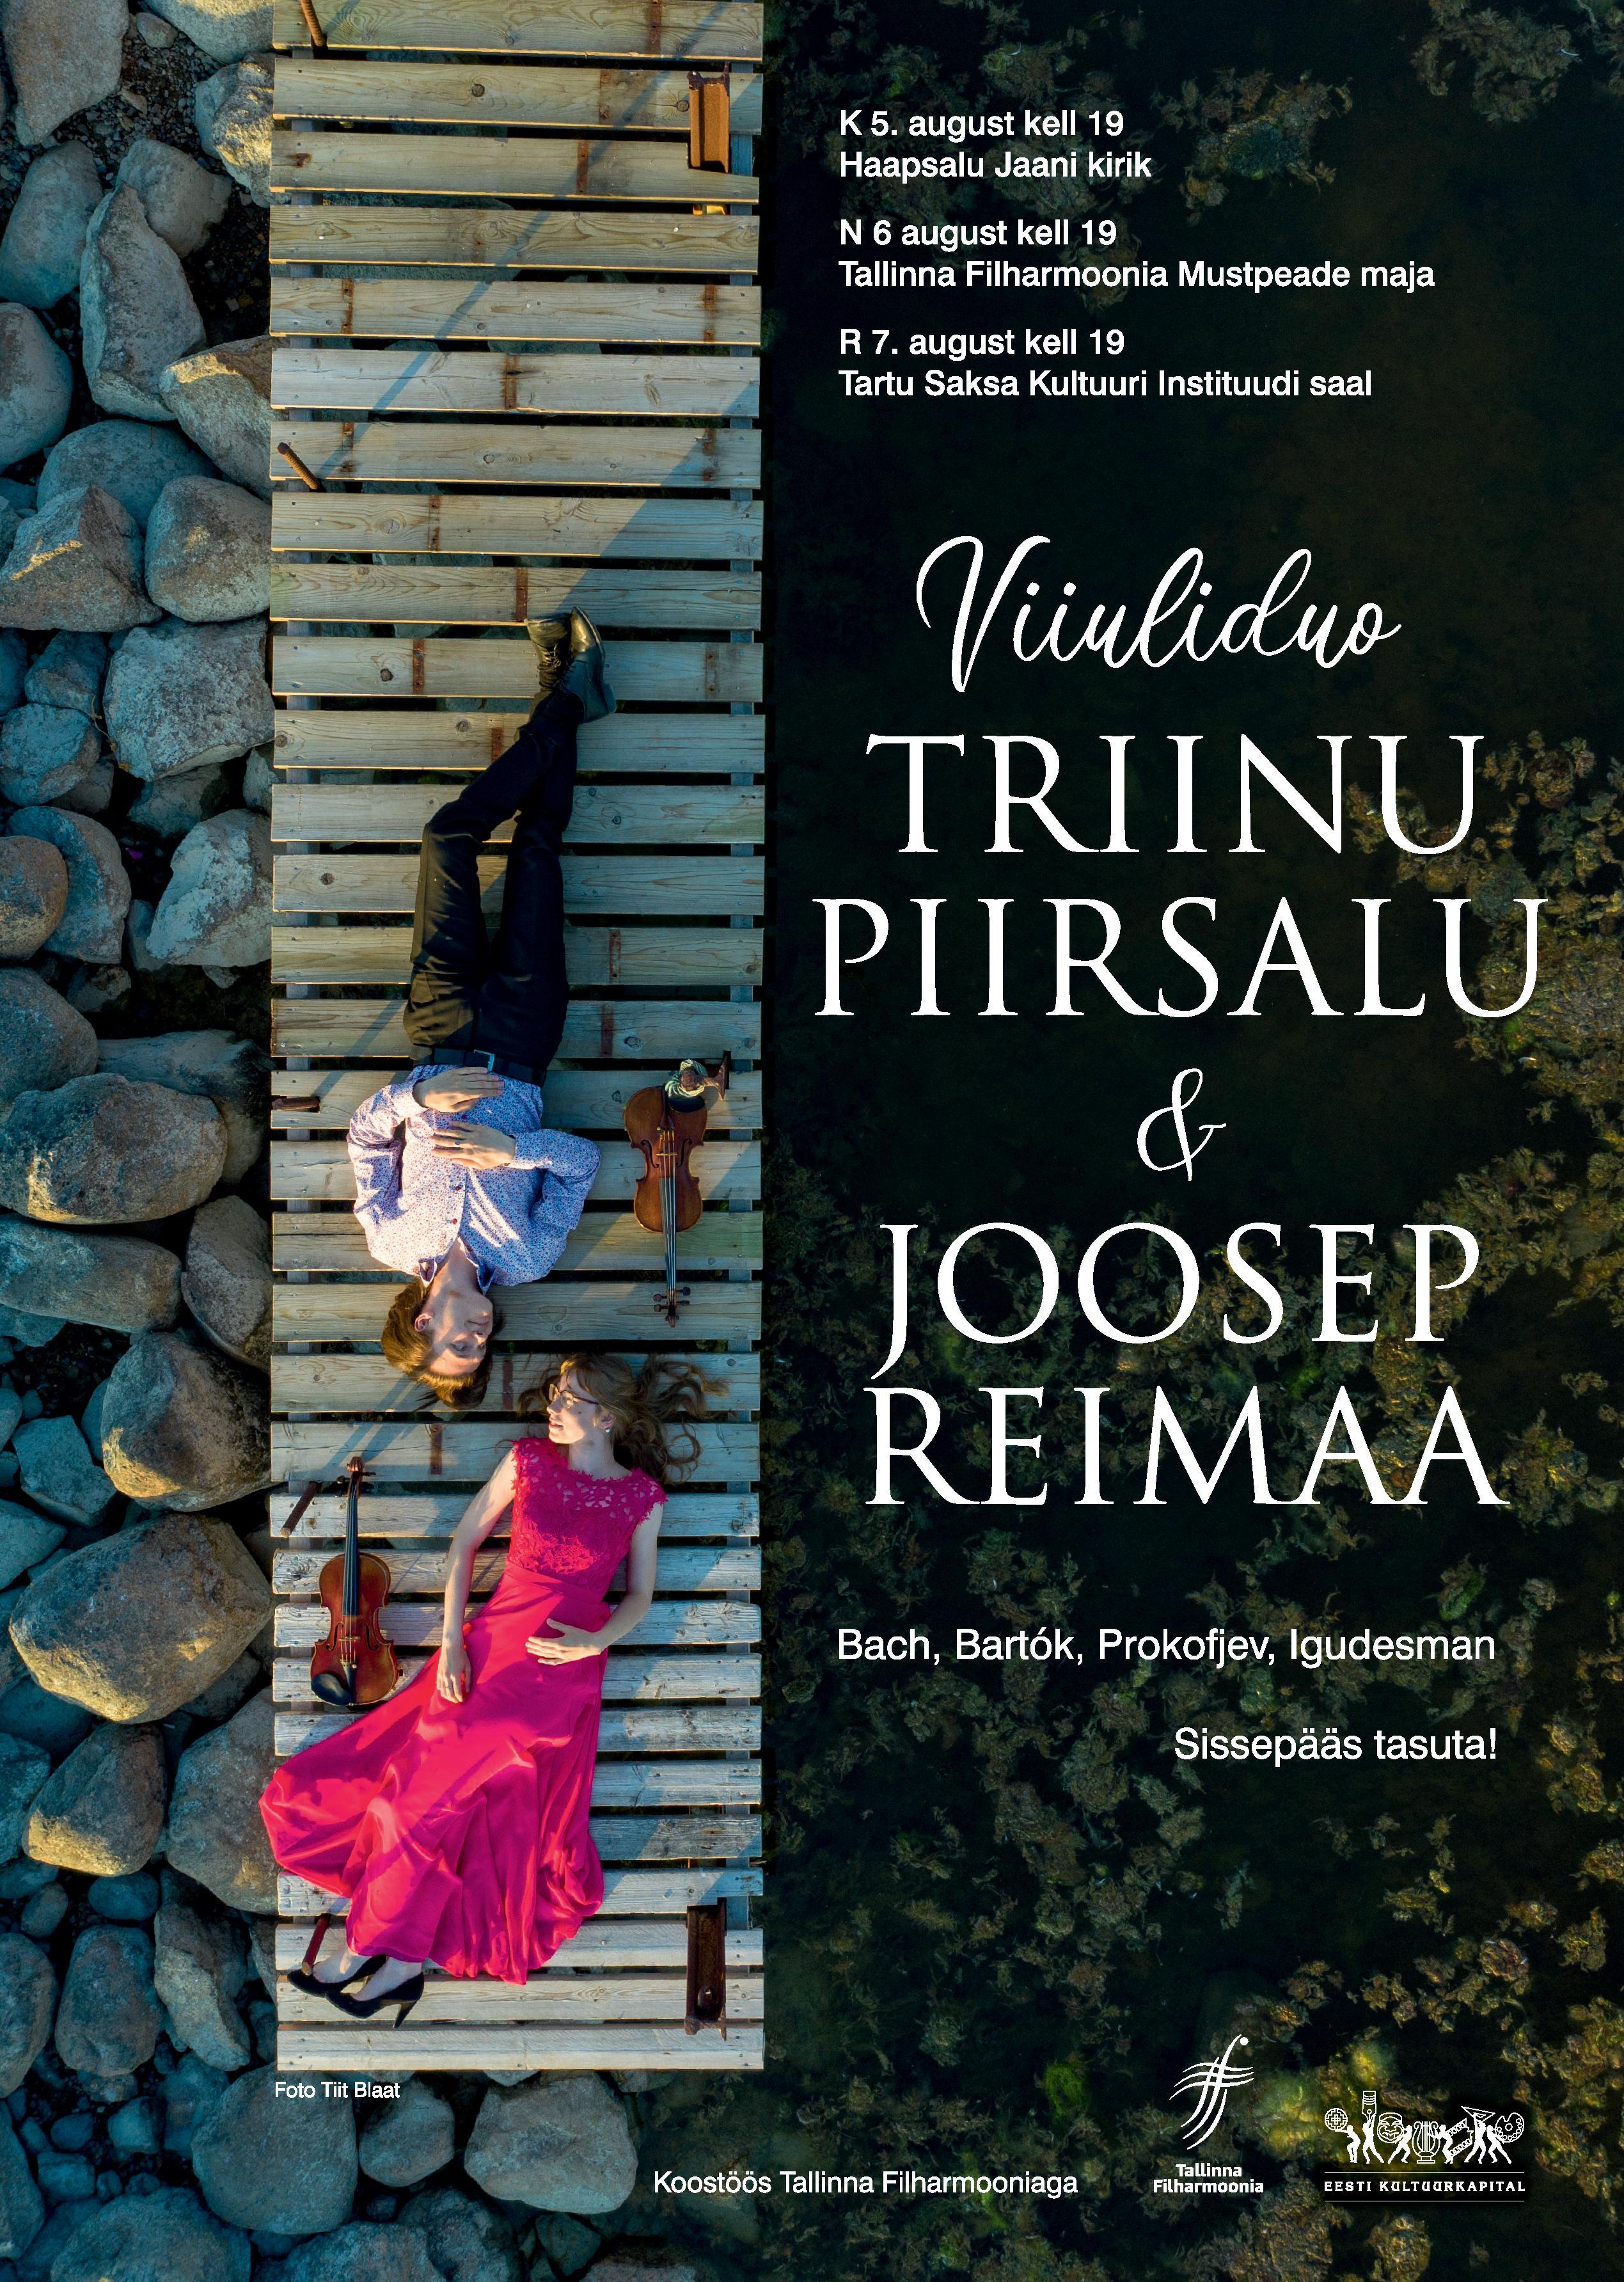 Viiuliduo Triinu Piirsalu & Joosep Reimaa